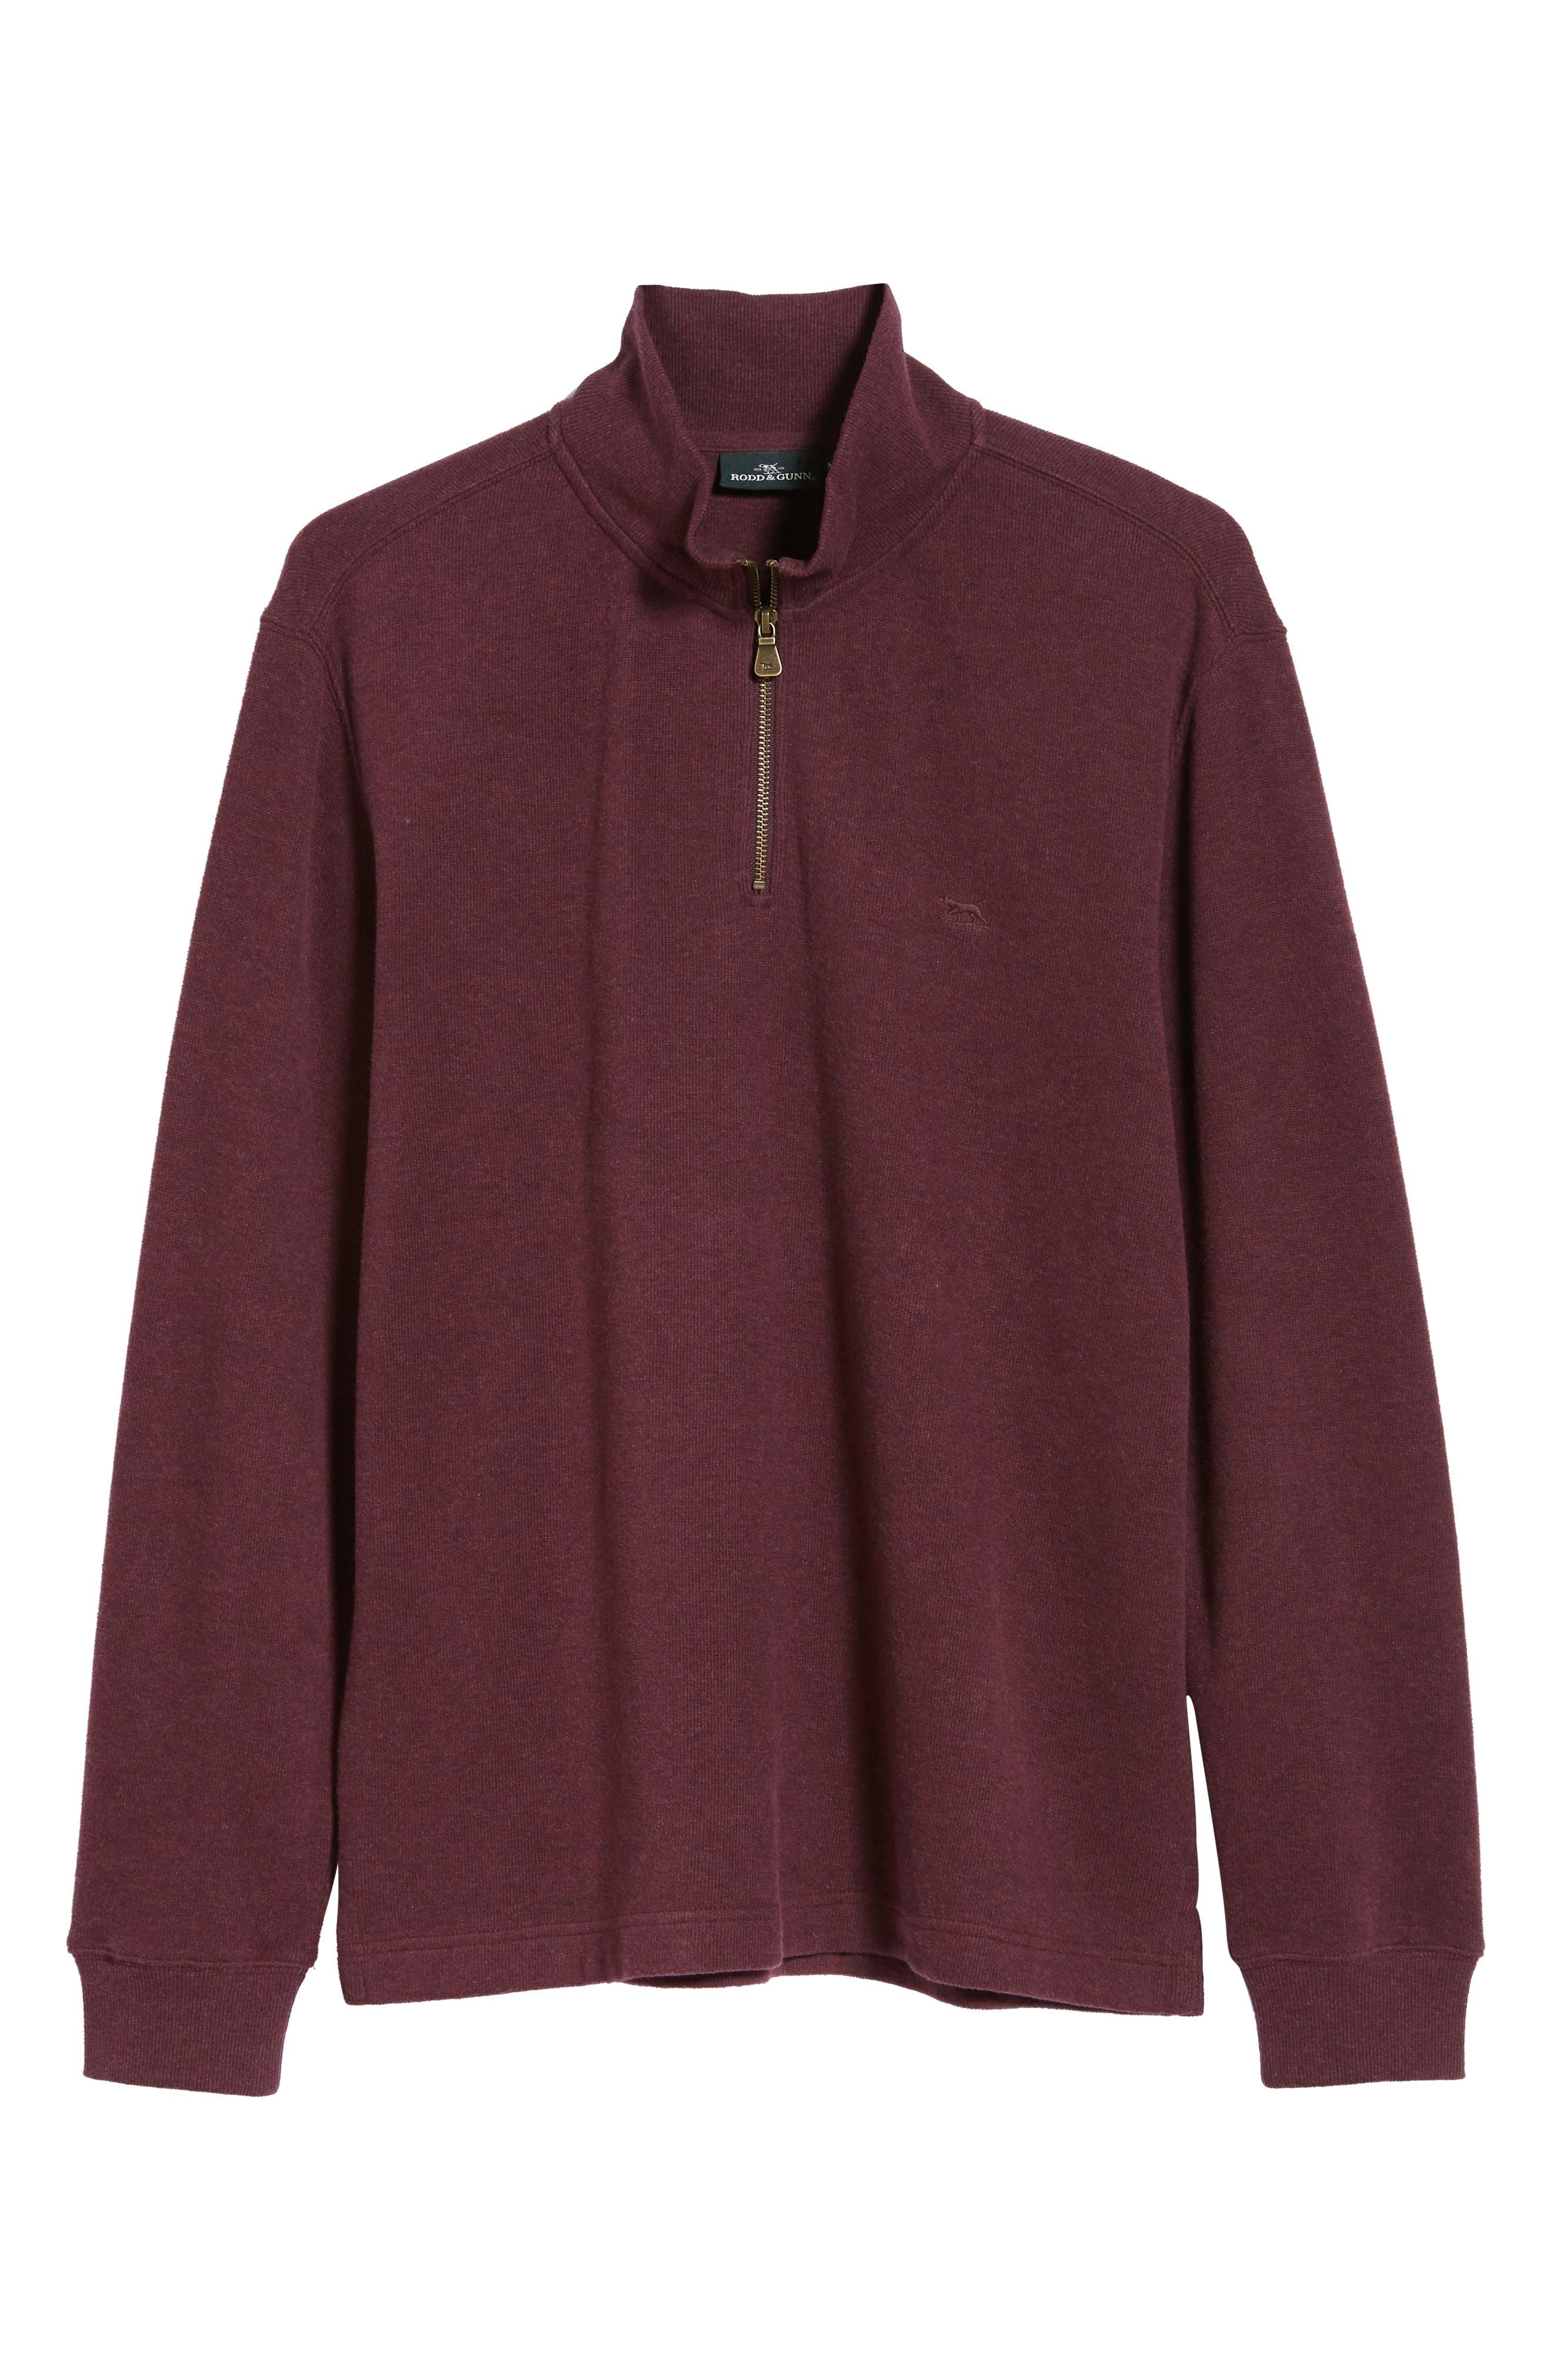 RODD & GUNN, Alton Ave Regular Fit Pullover Sweatshirt, Alternate thumbnail 6, color, BURGUNDY